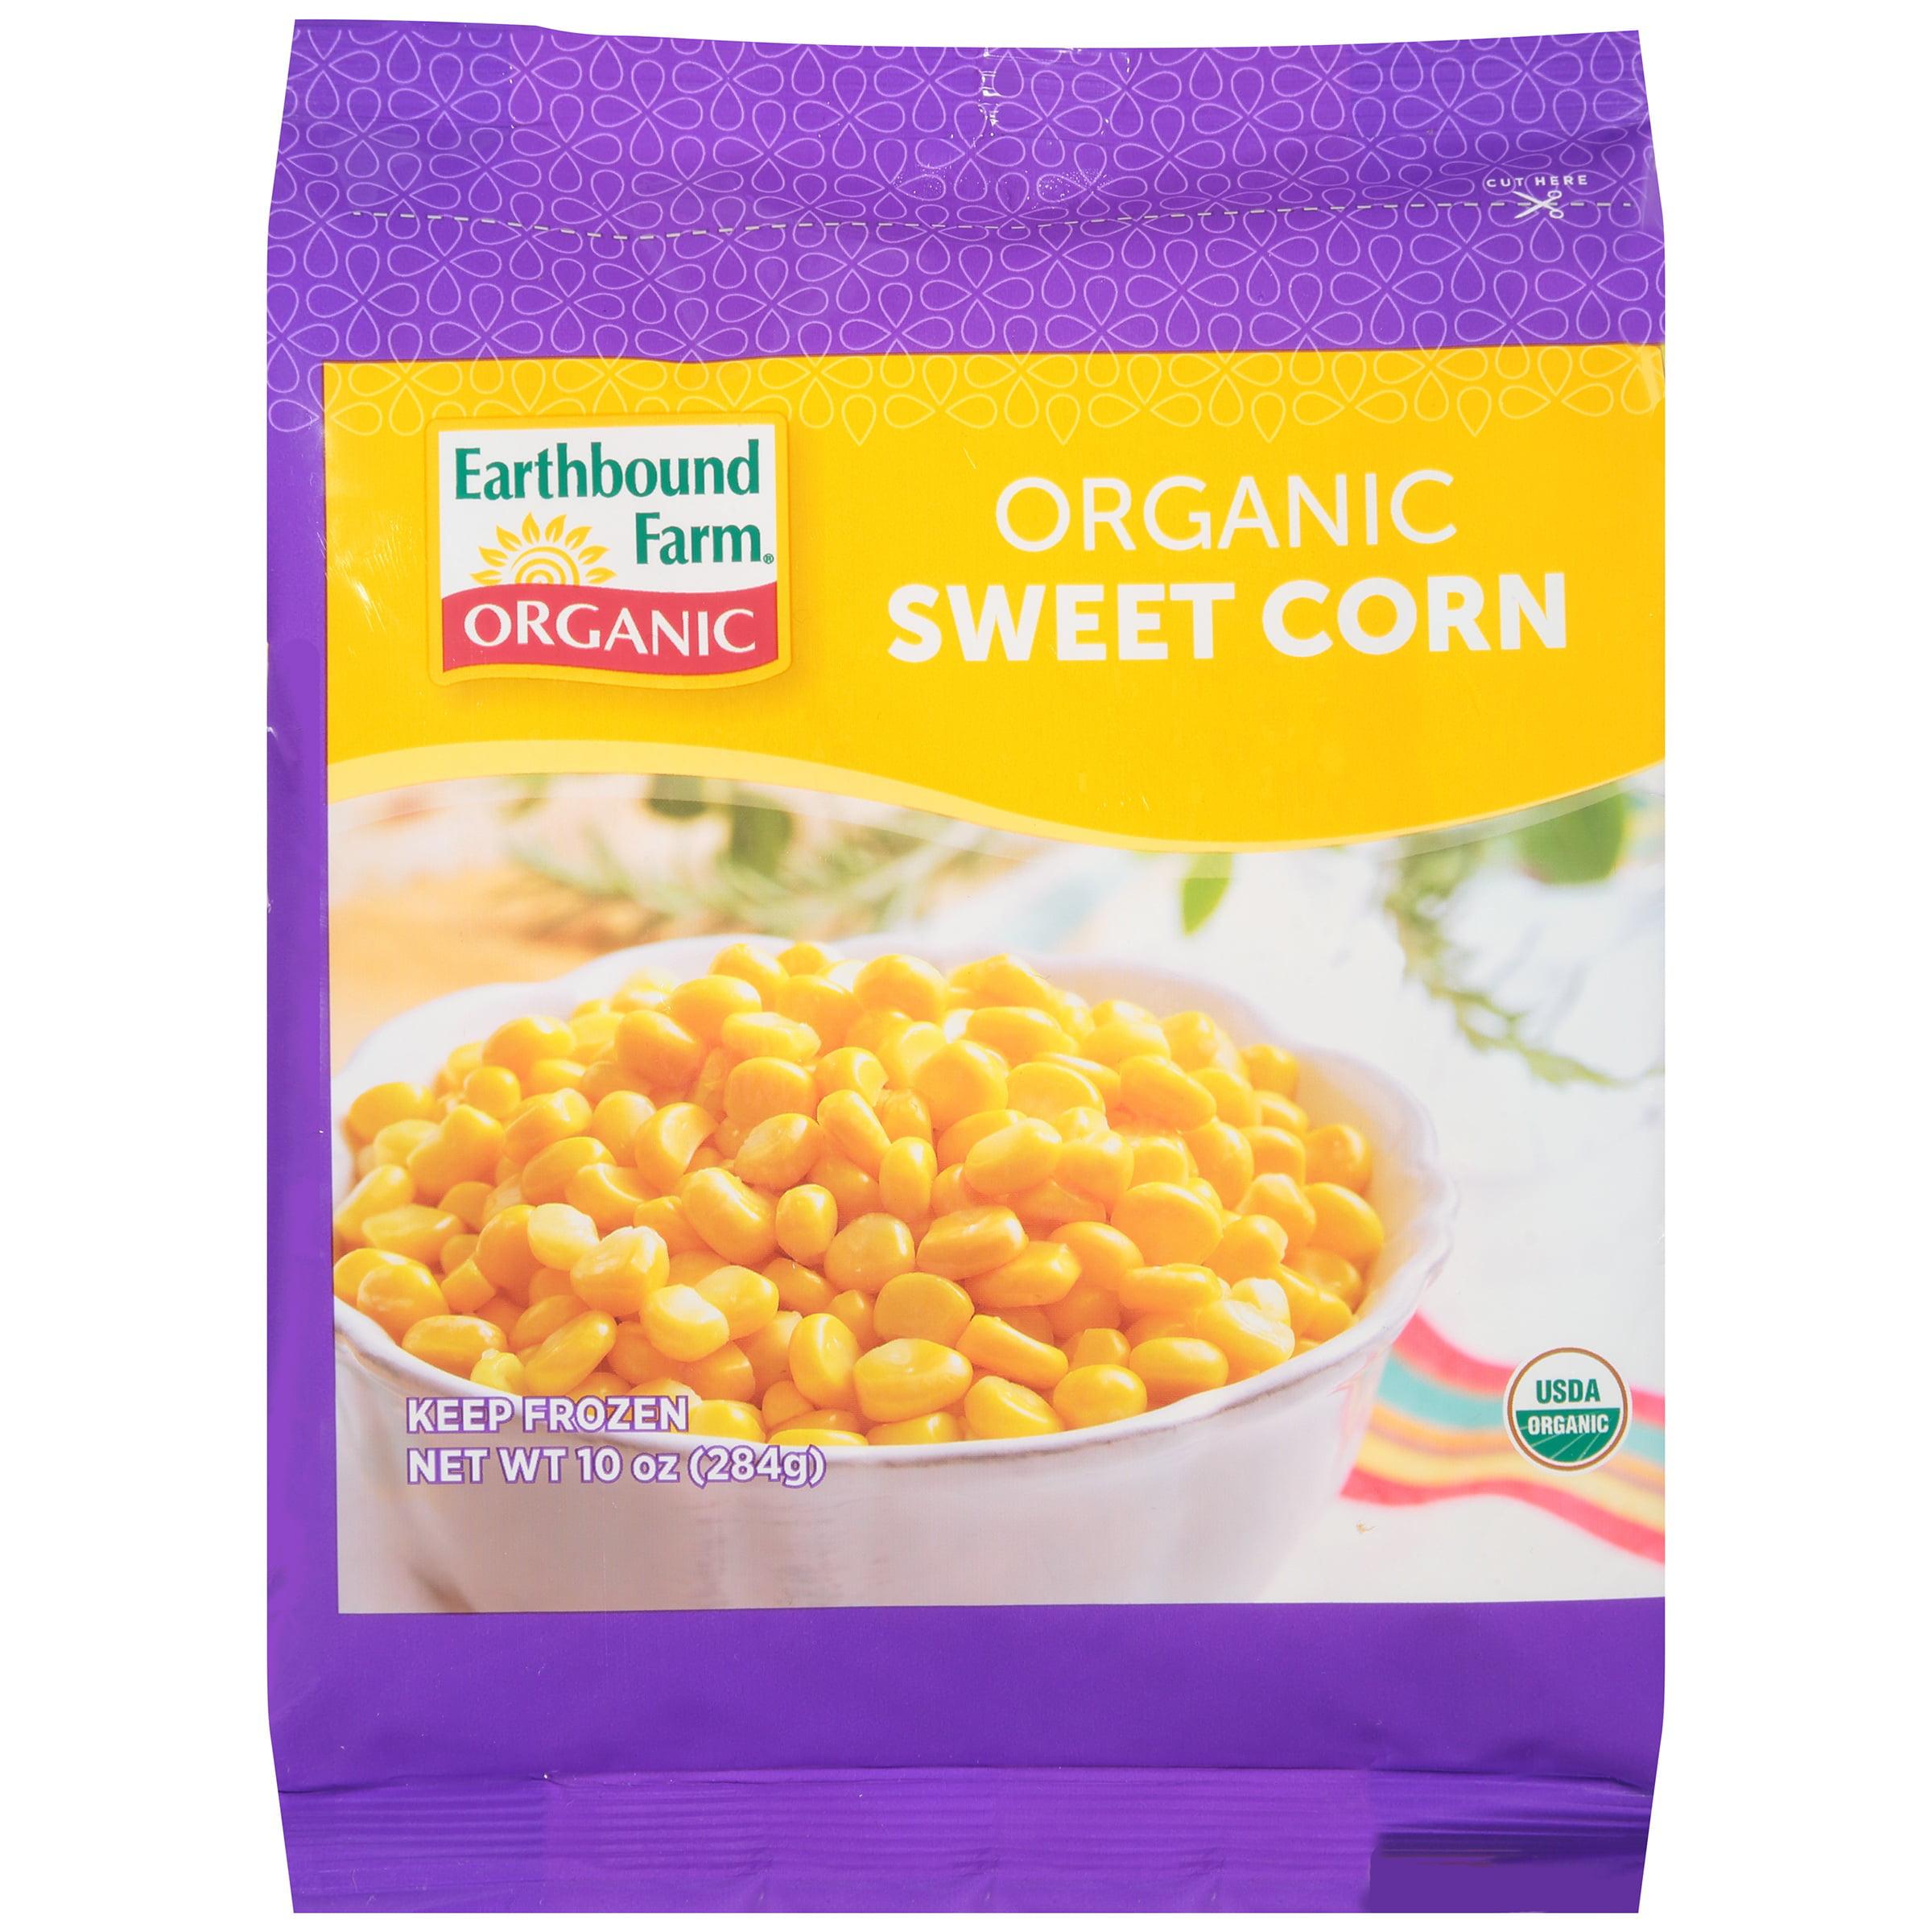 earthbound farm organic sweet corn 10 oz bag walmart com